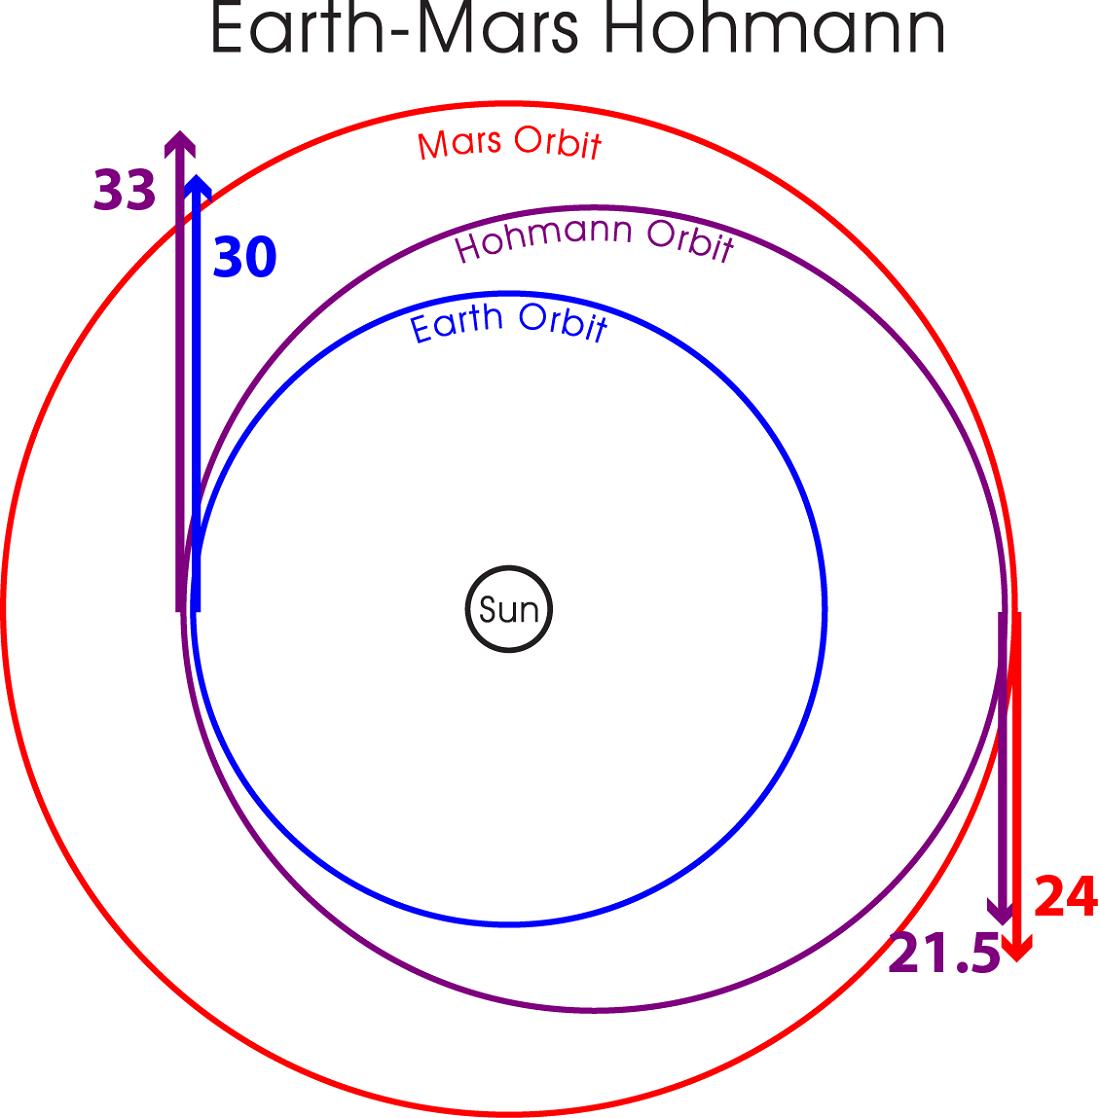 Venn Diagram of the Solar System